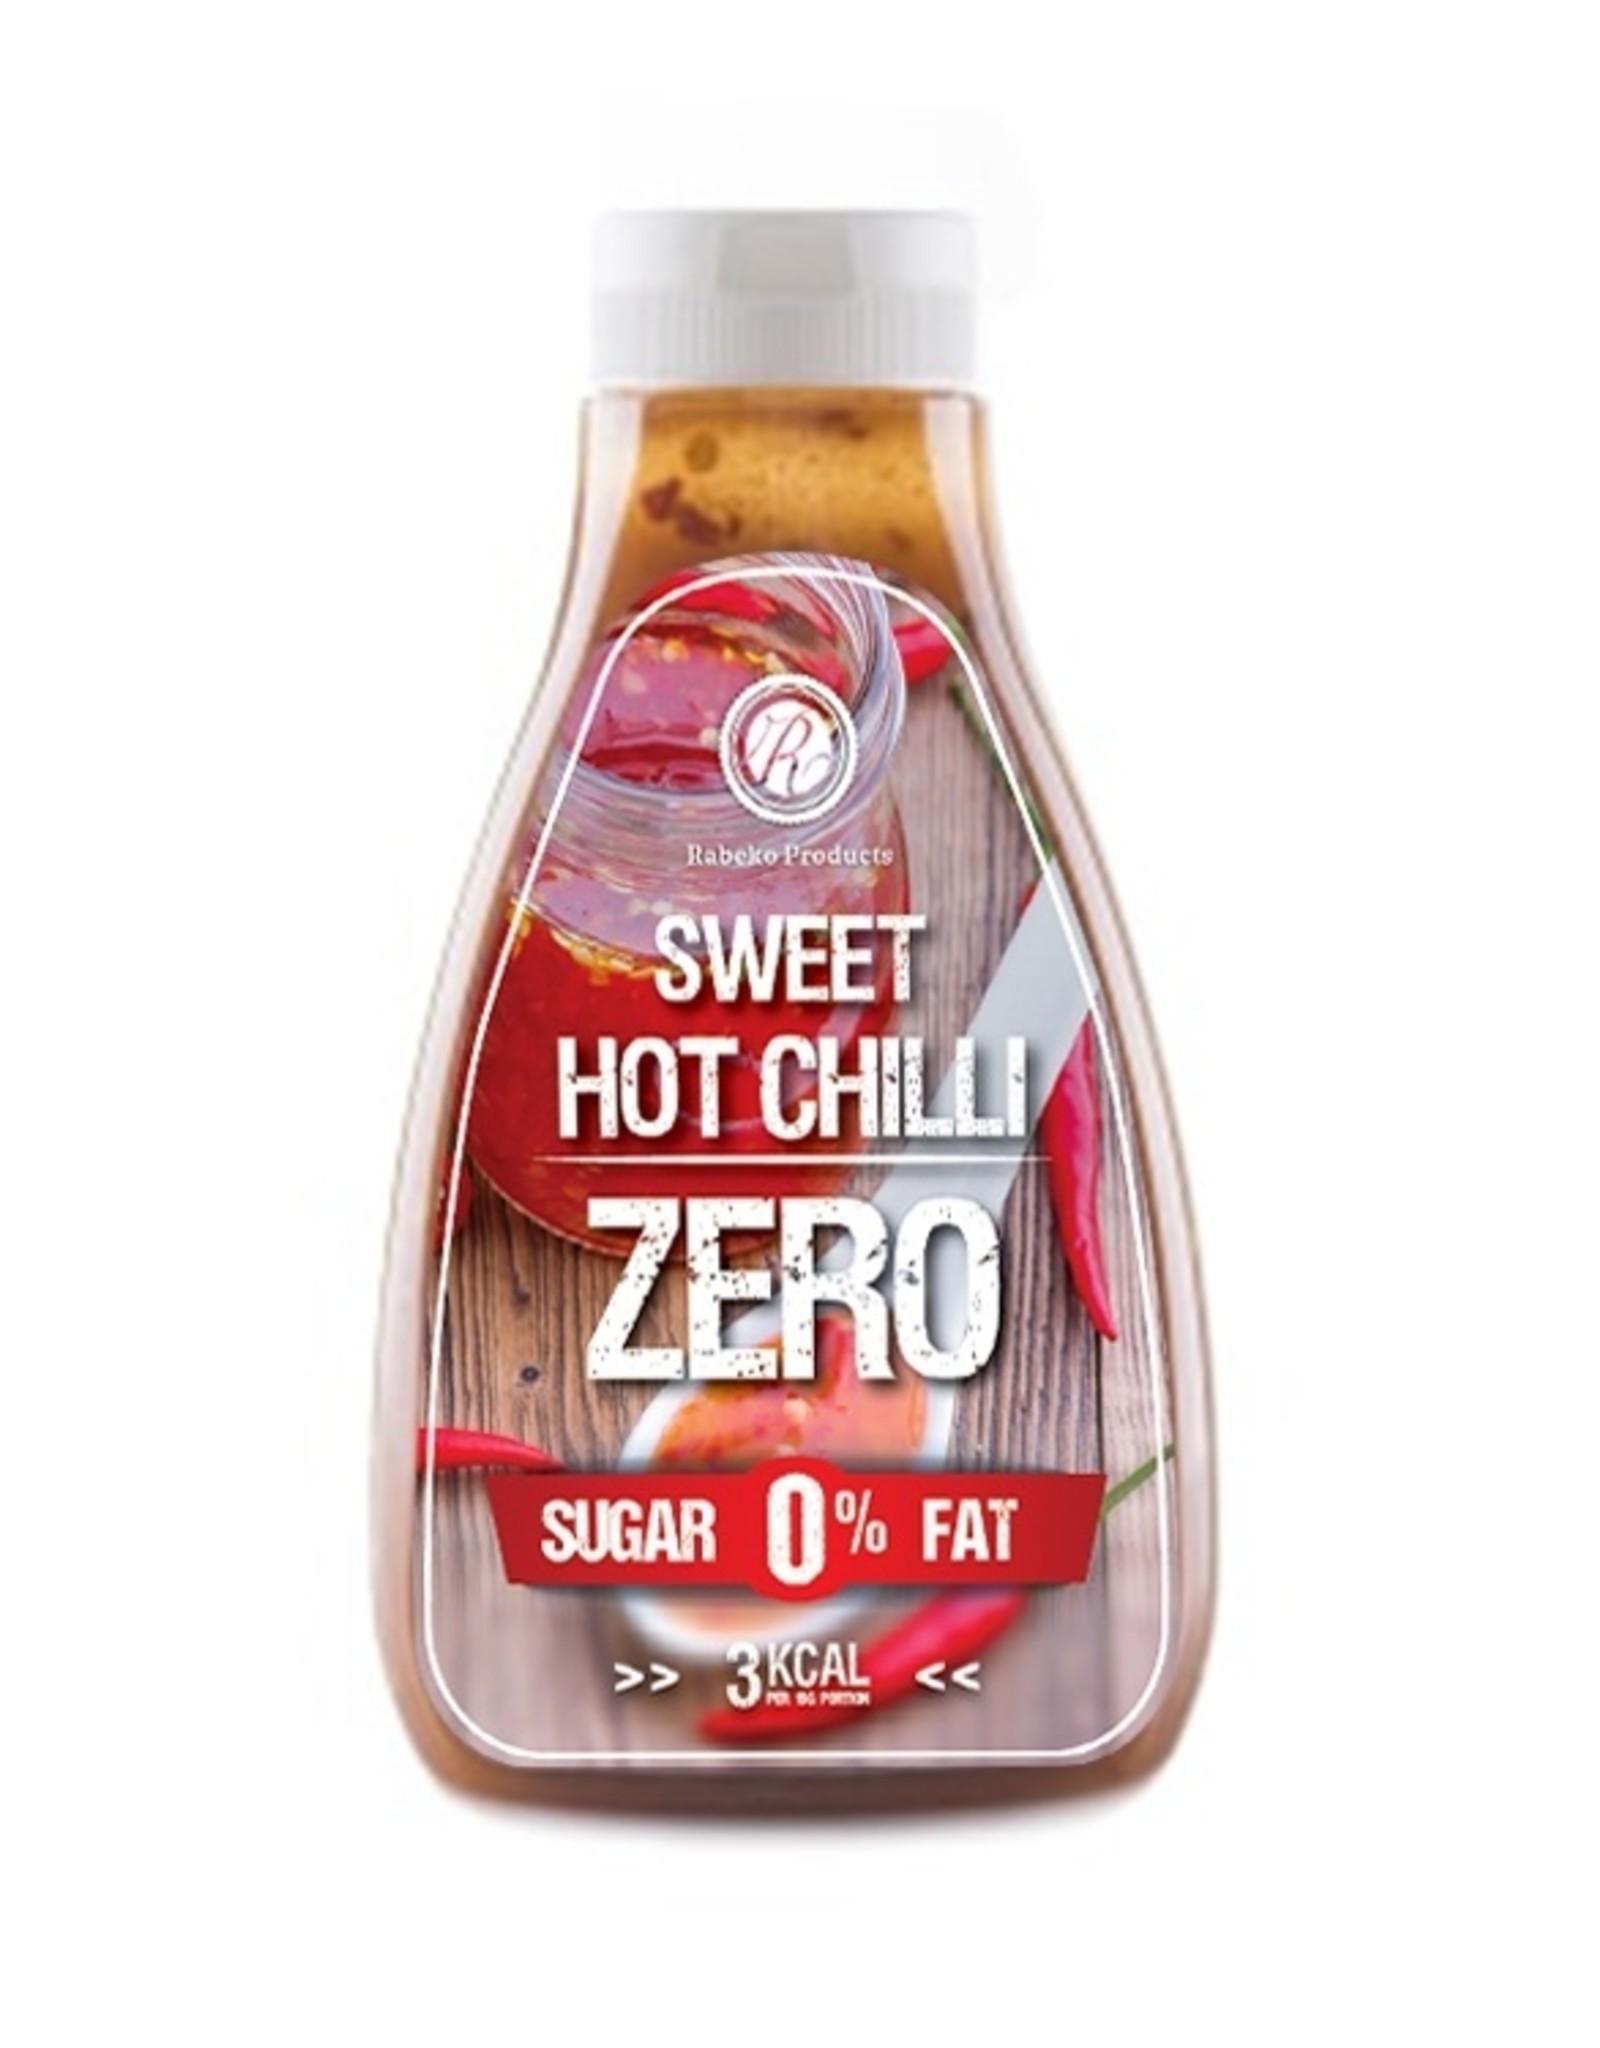 Rabeko Sweet Hot Chili